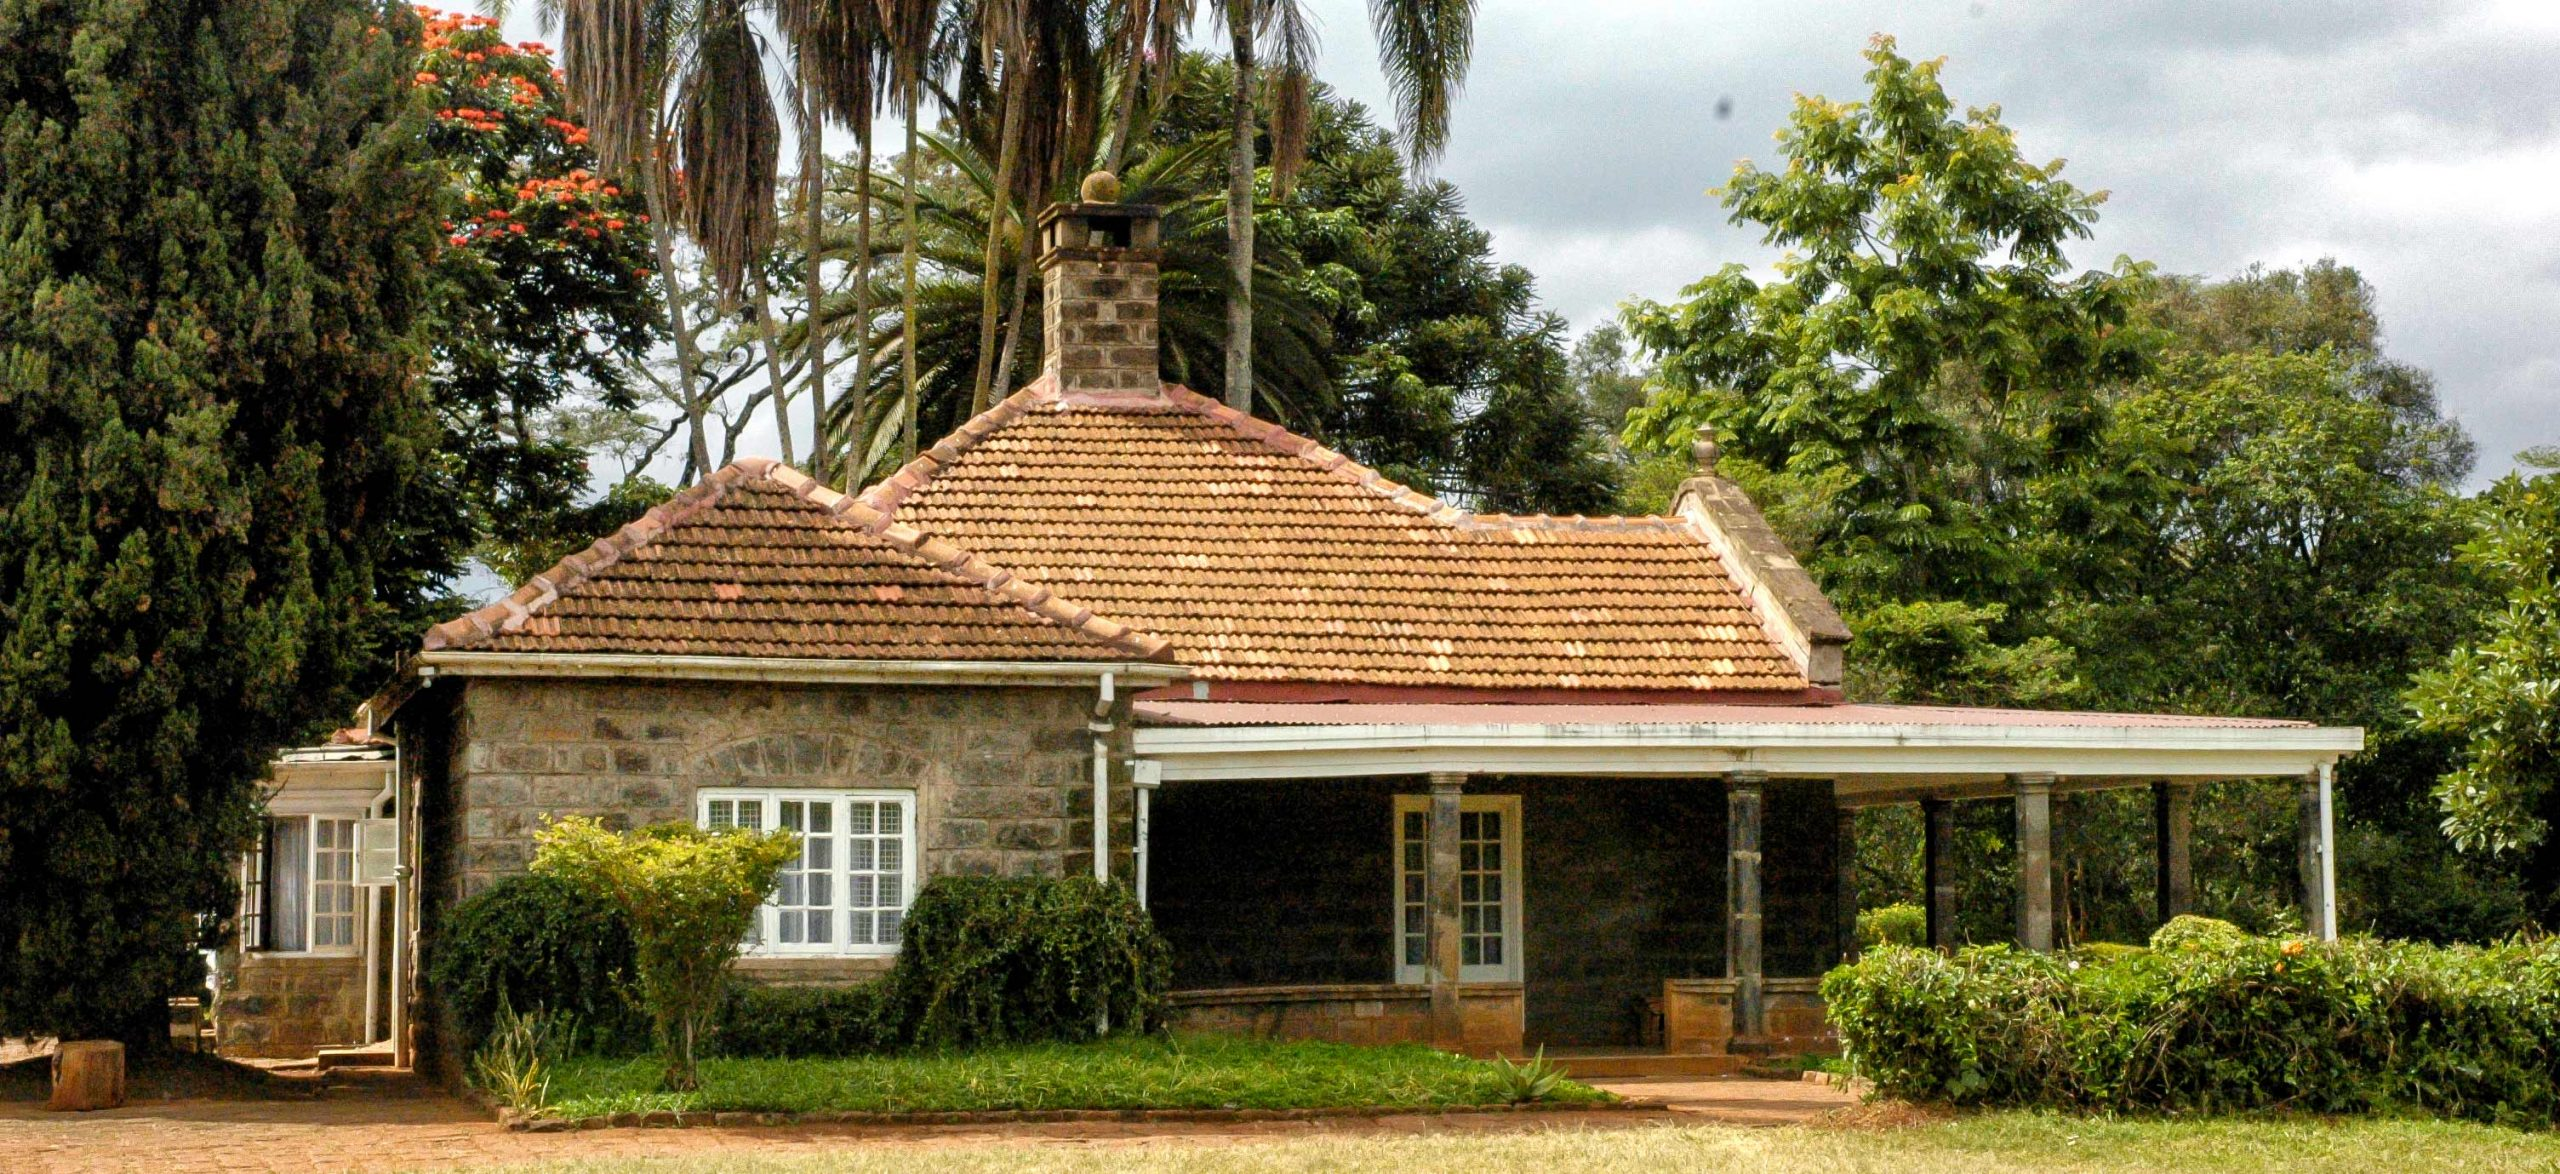 El Museo de Karen Blixen en Nairobi - Qué ver en Kenia